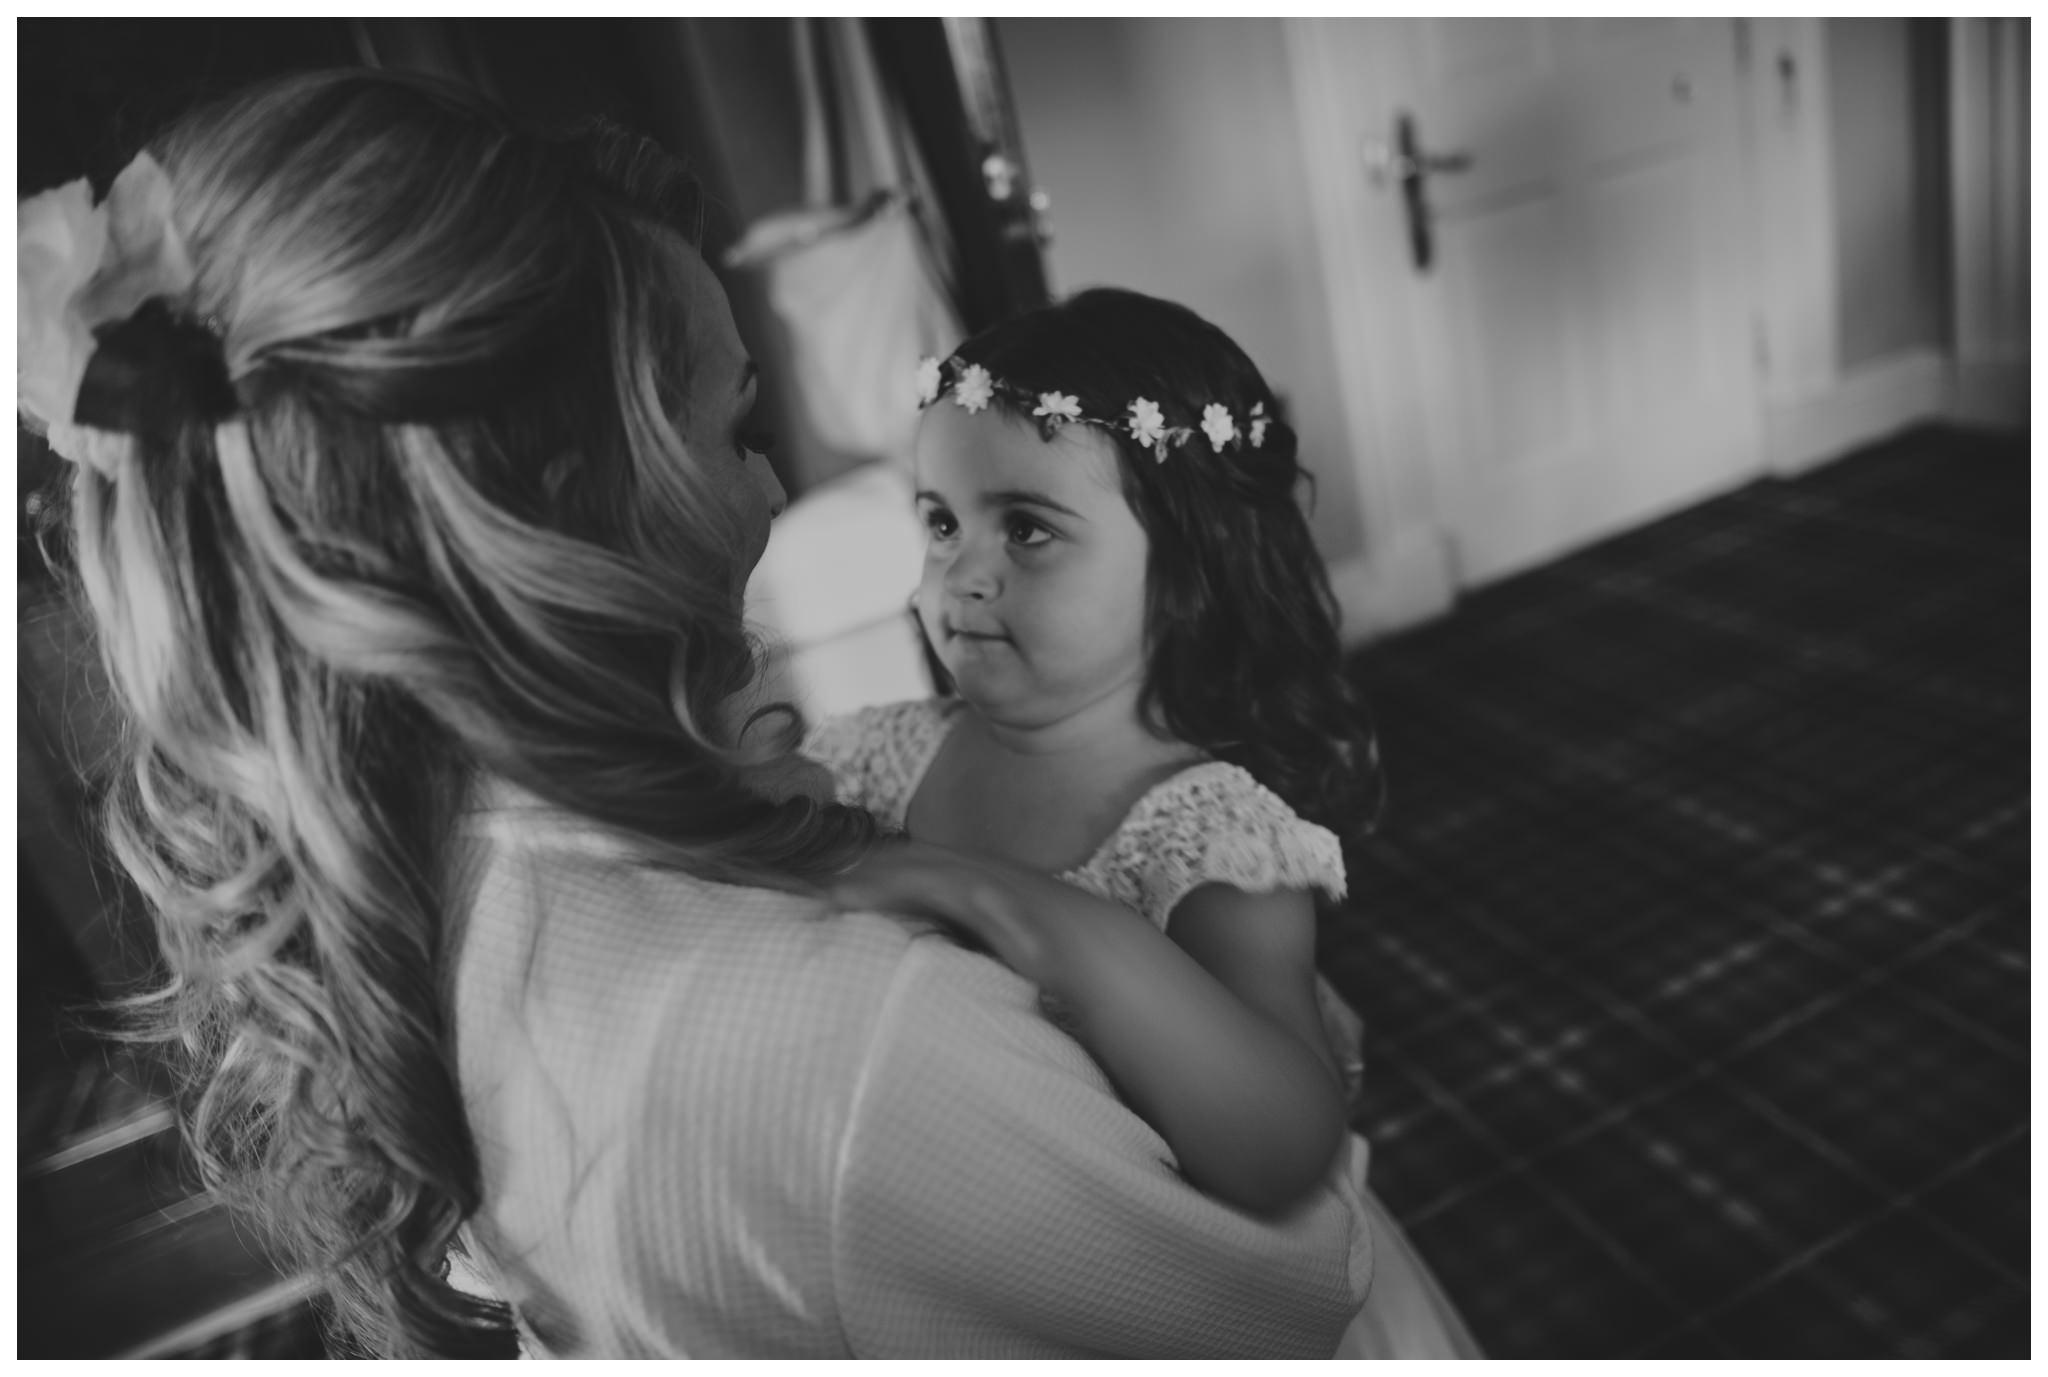 Richard Savage Photography - Wedding - Peterstone Court Brecon - 2016-05-11_0011